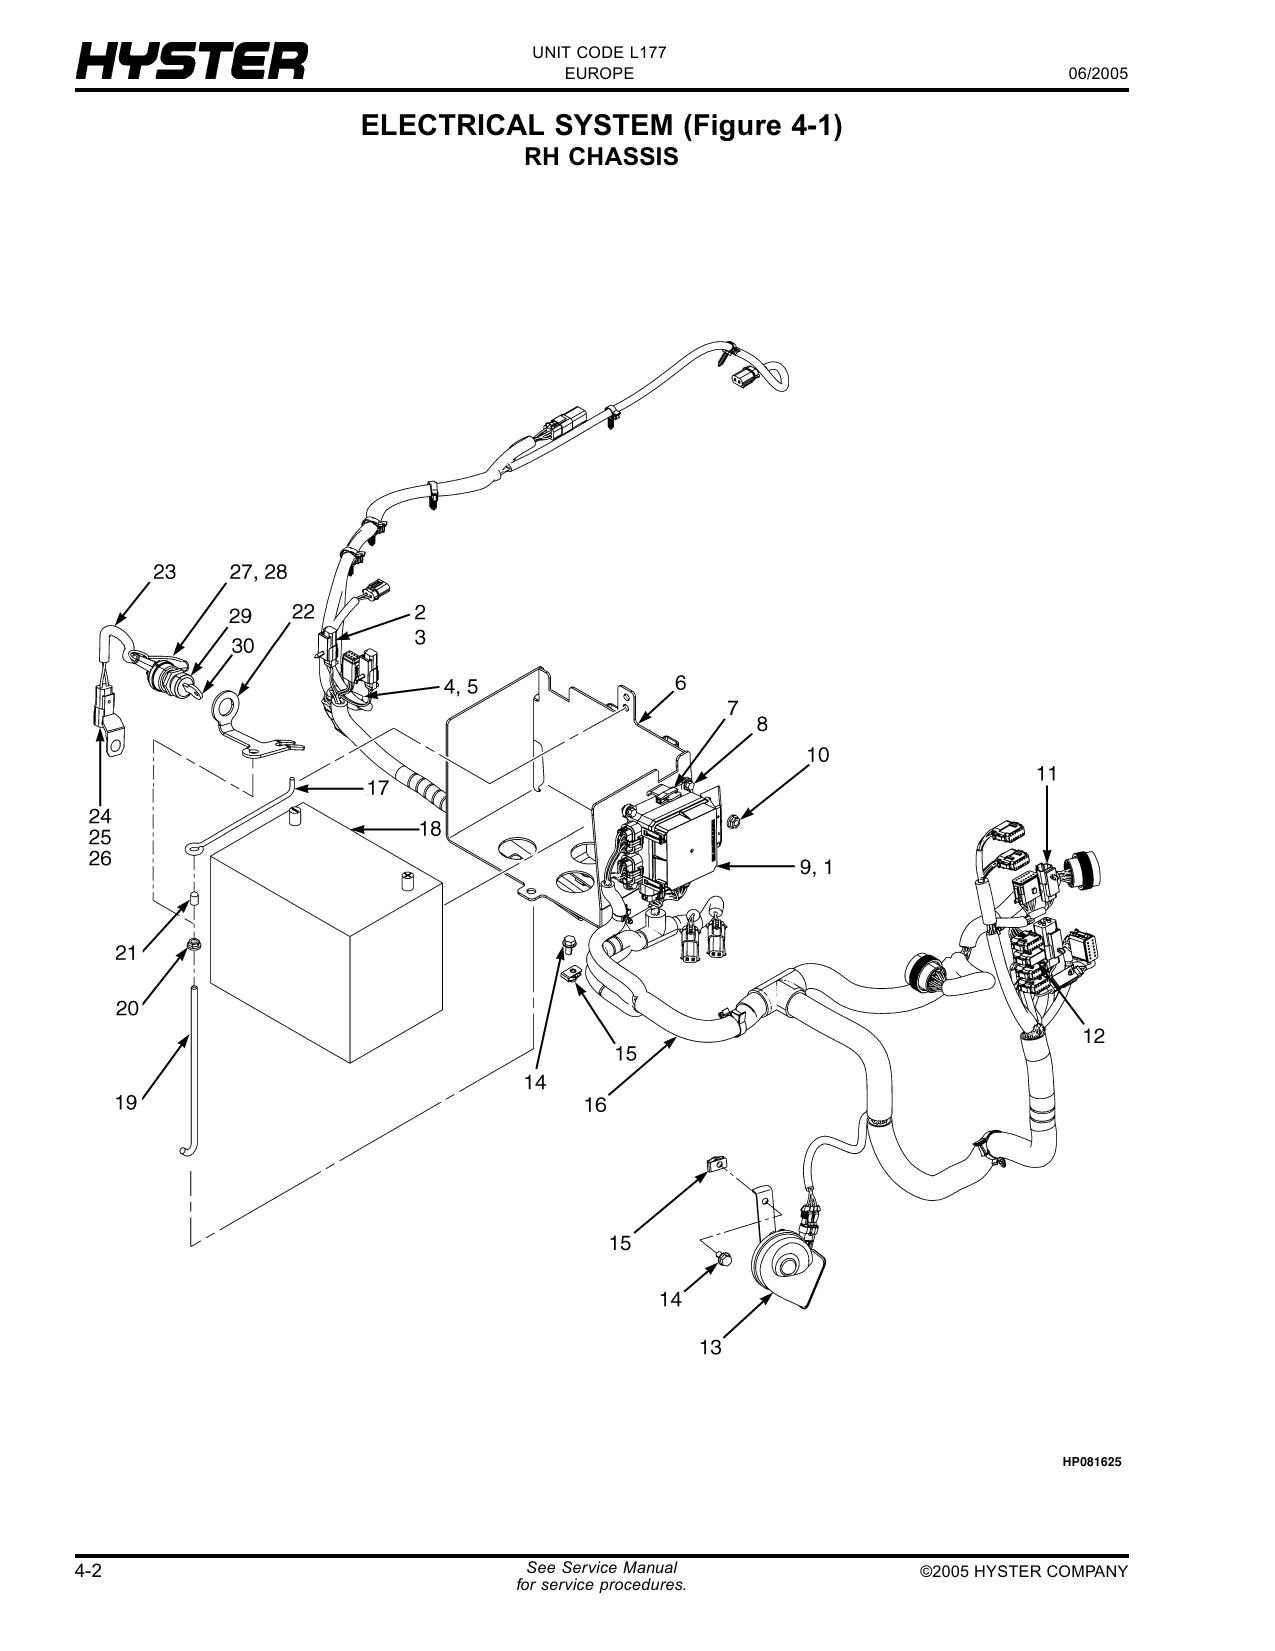 Depicaptcachemgosney20050705190338010 Tfa00916 Monotrol Pedal Wiring Diagram